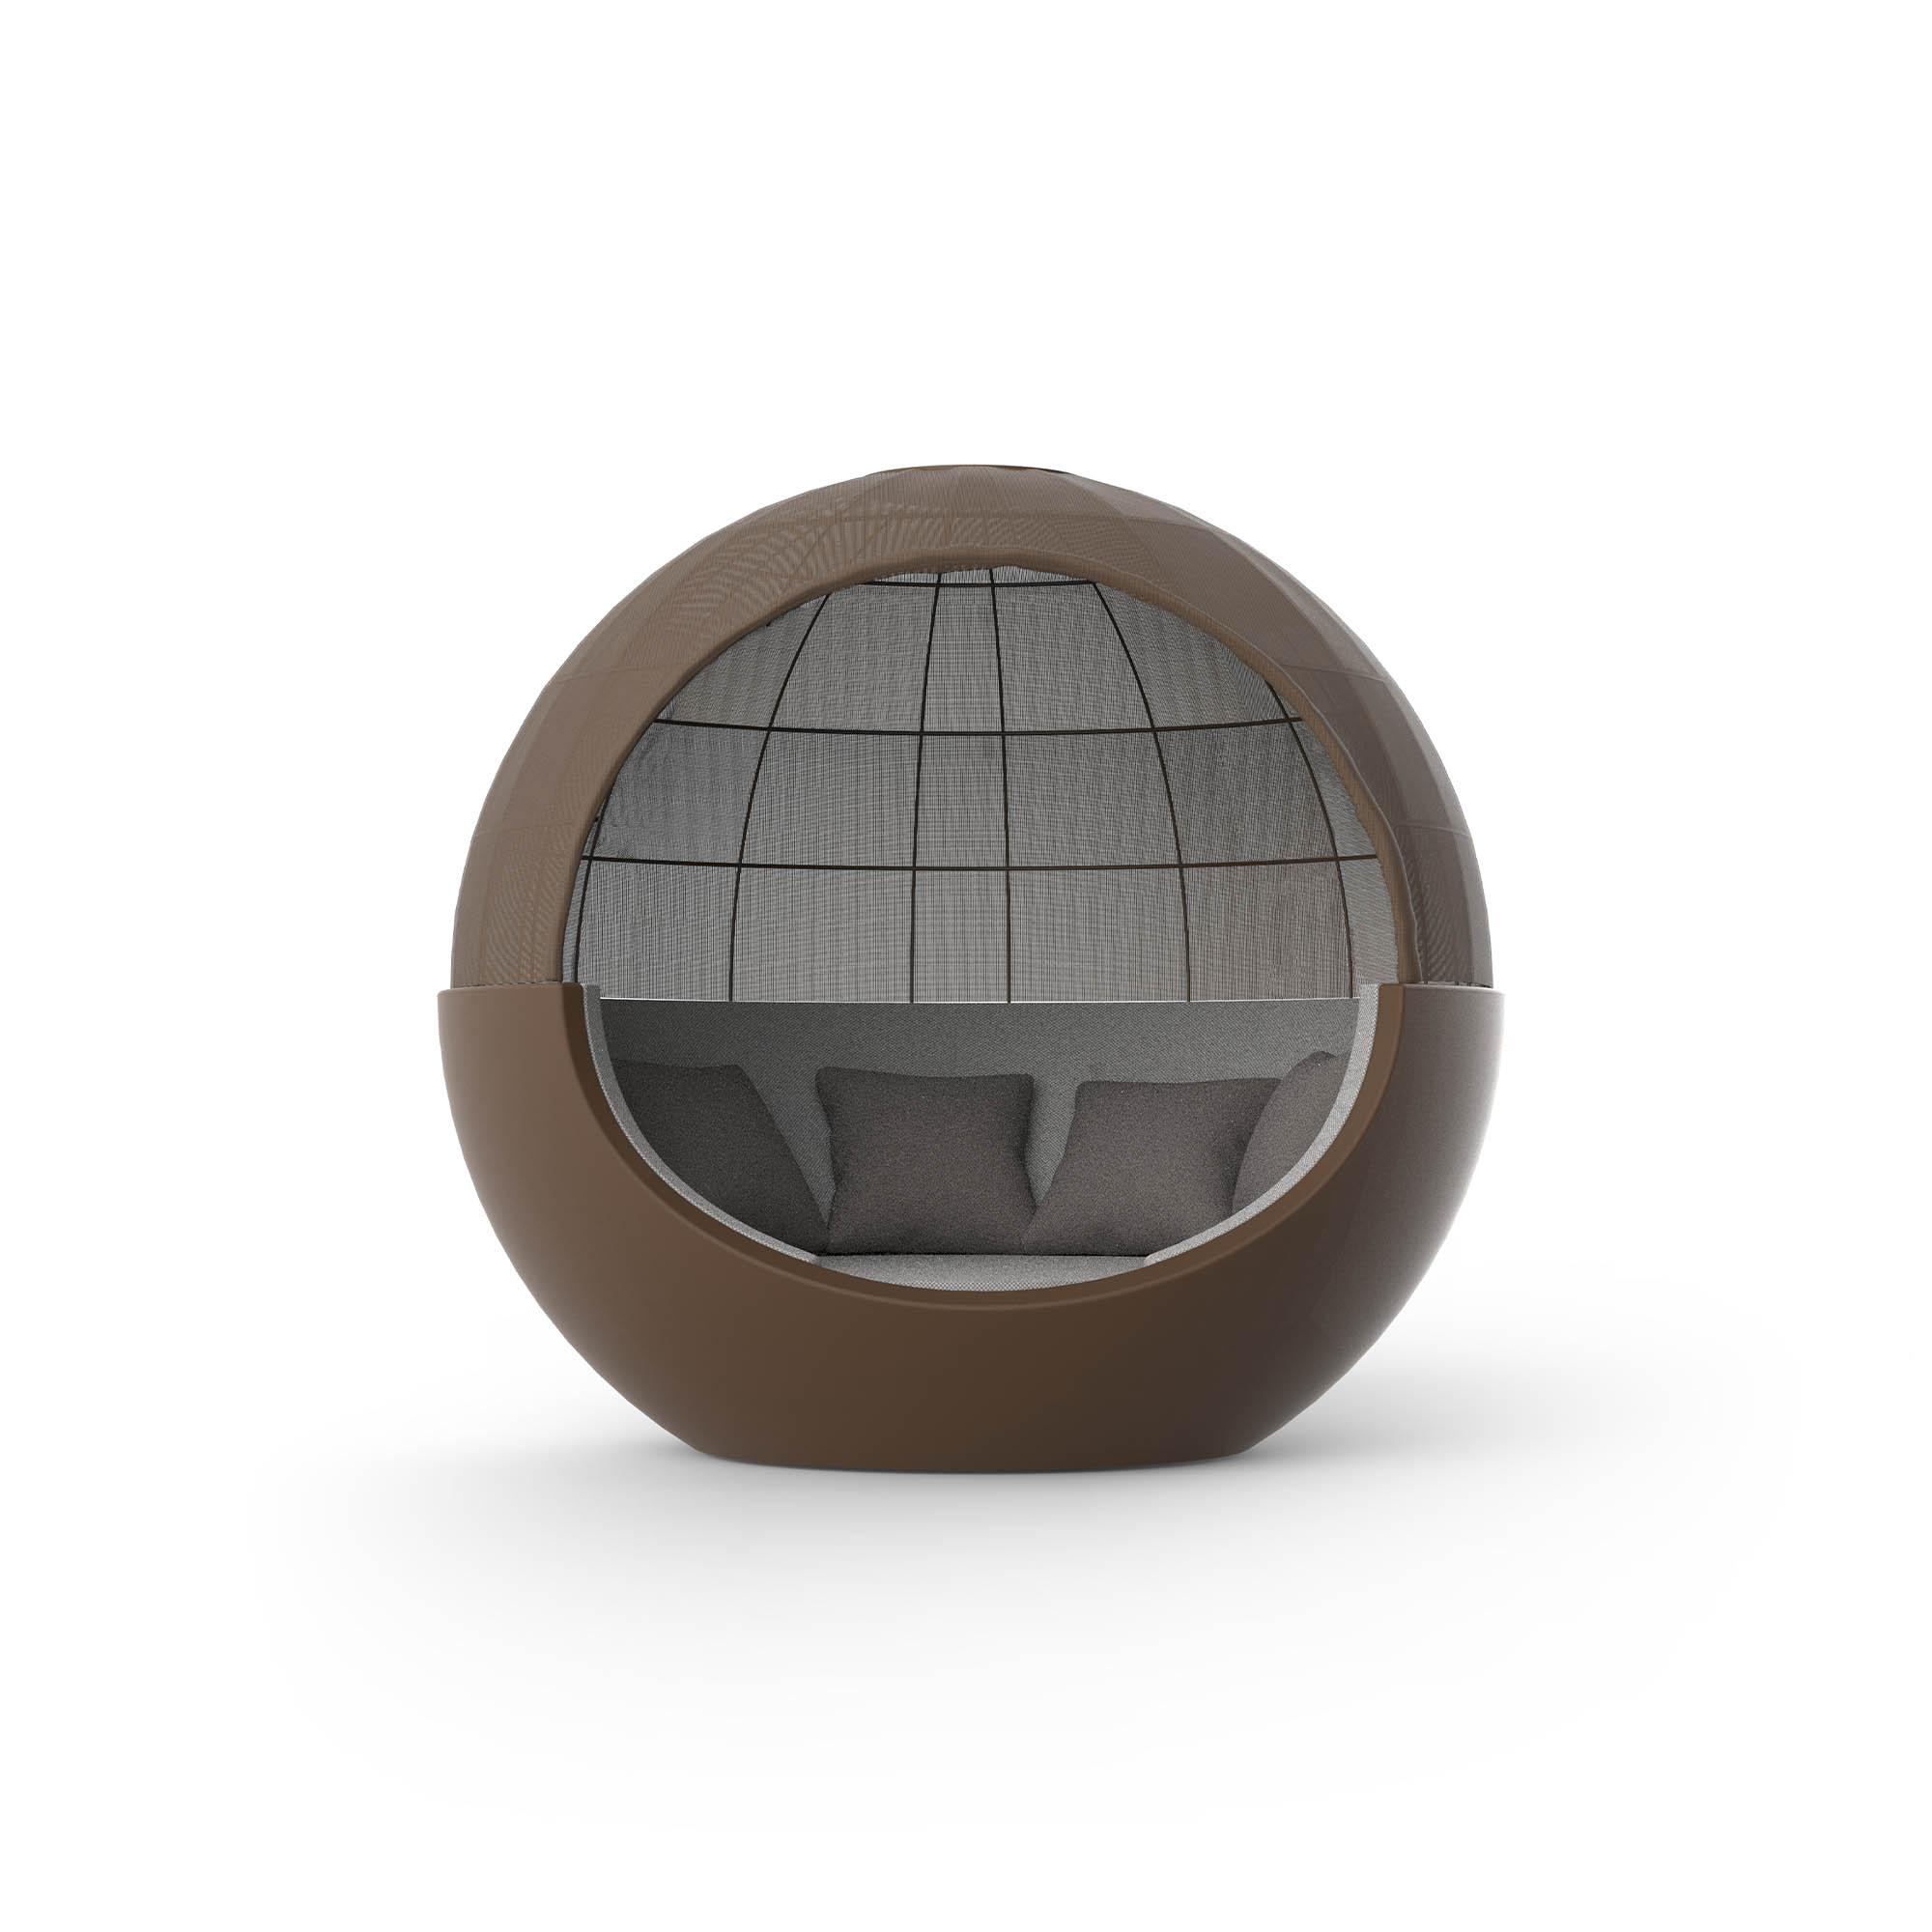 MOON_ULM_DAYBED VONDOM OUTDOOR DESIGN BED POOL LUXURY DISENO EXTERIOR(2)